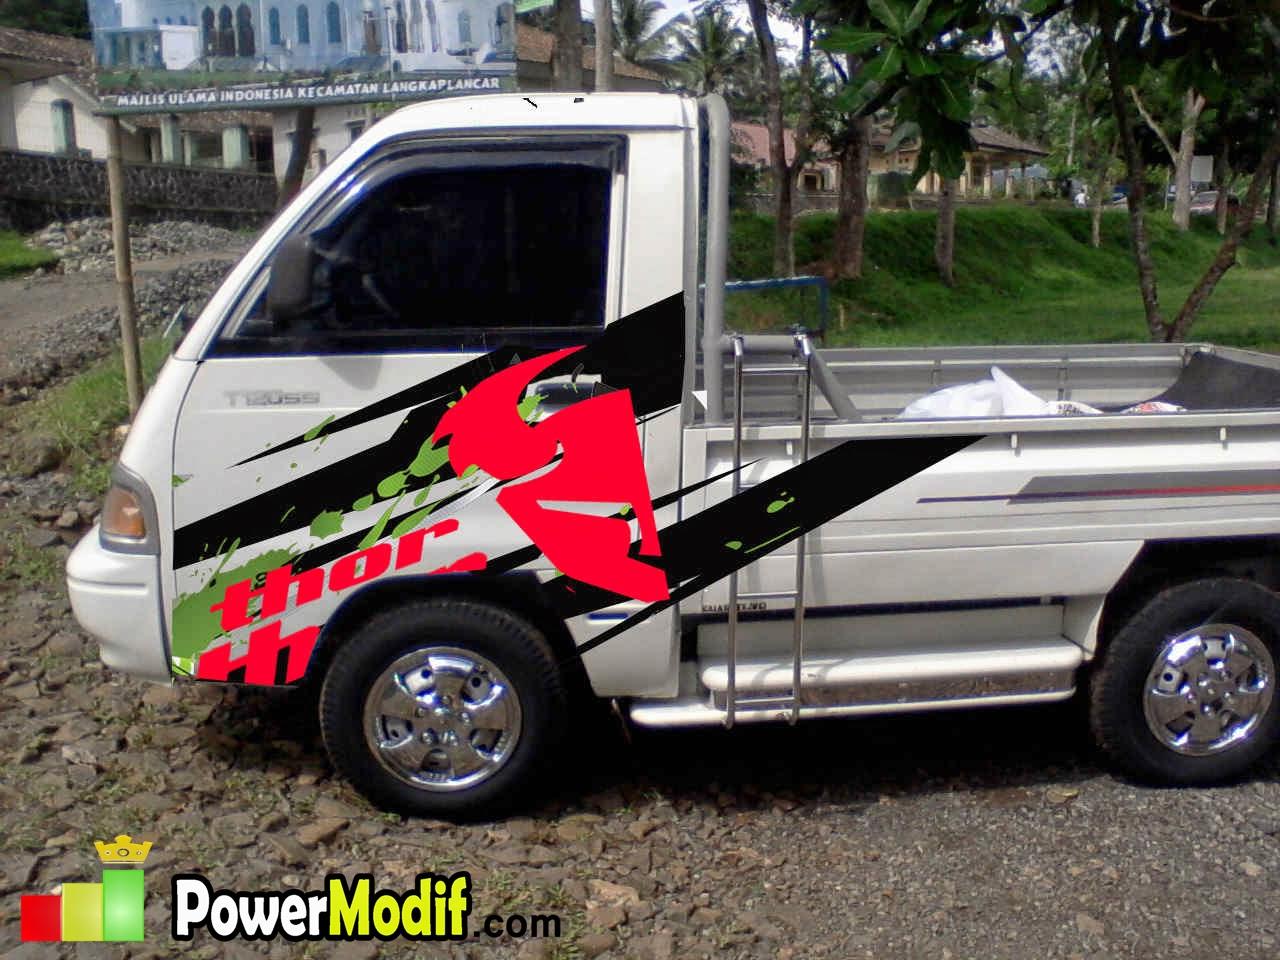 Mitsubishi T SS Modifikasi Powermodif Desain Dan Modifikasi